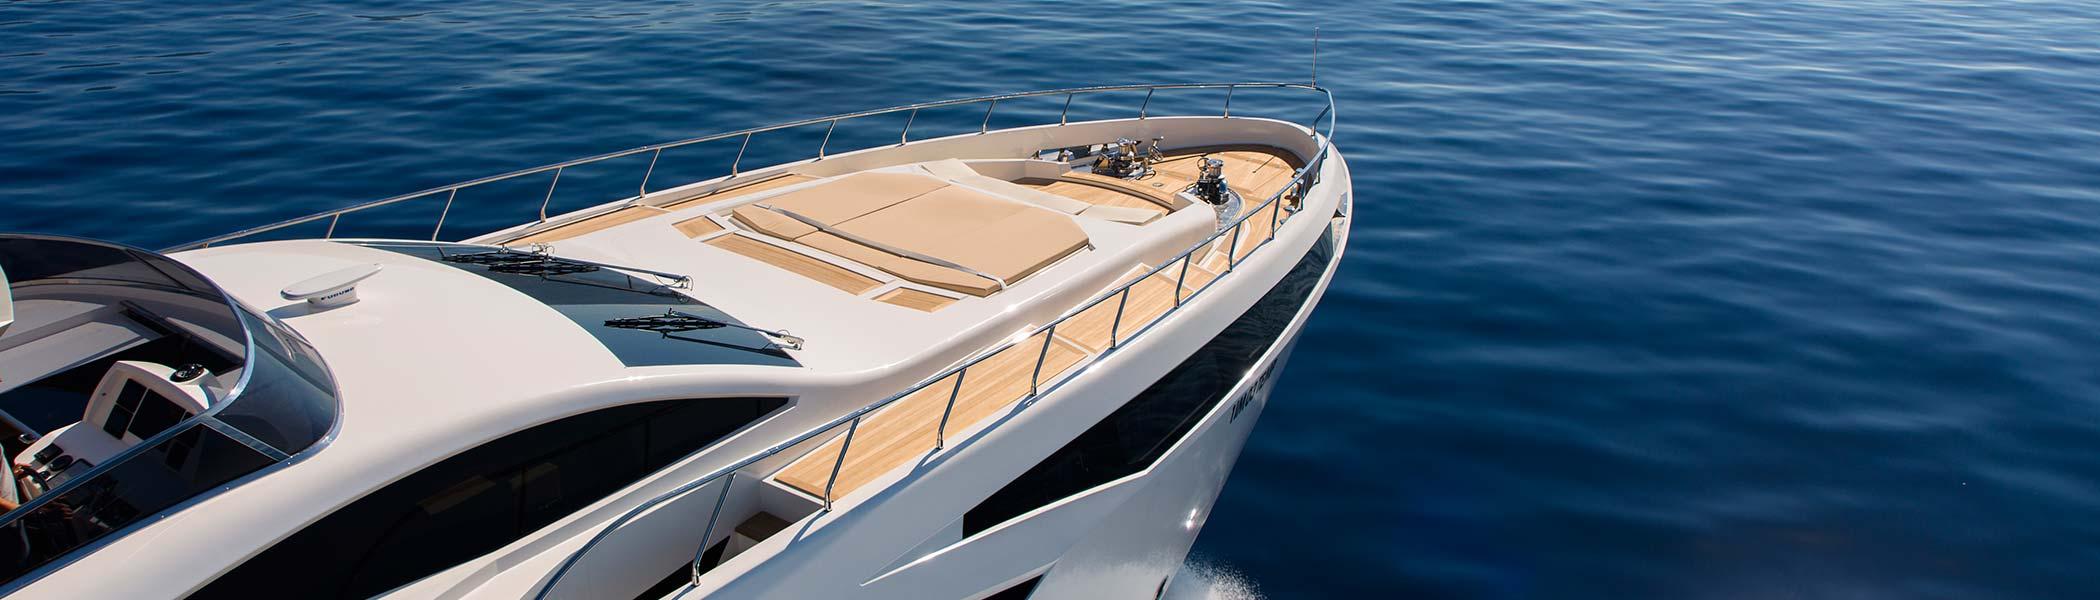 Amer Yacht - Amer Cento - NAVIGAZIONE-58